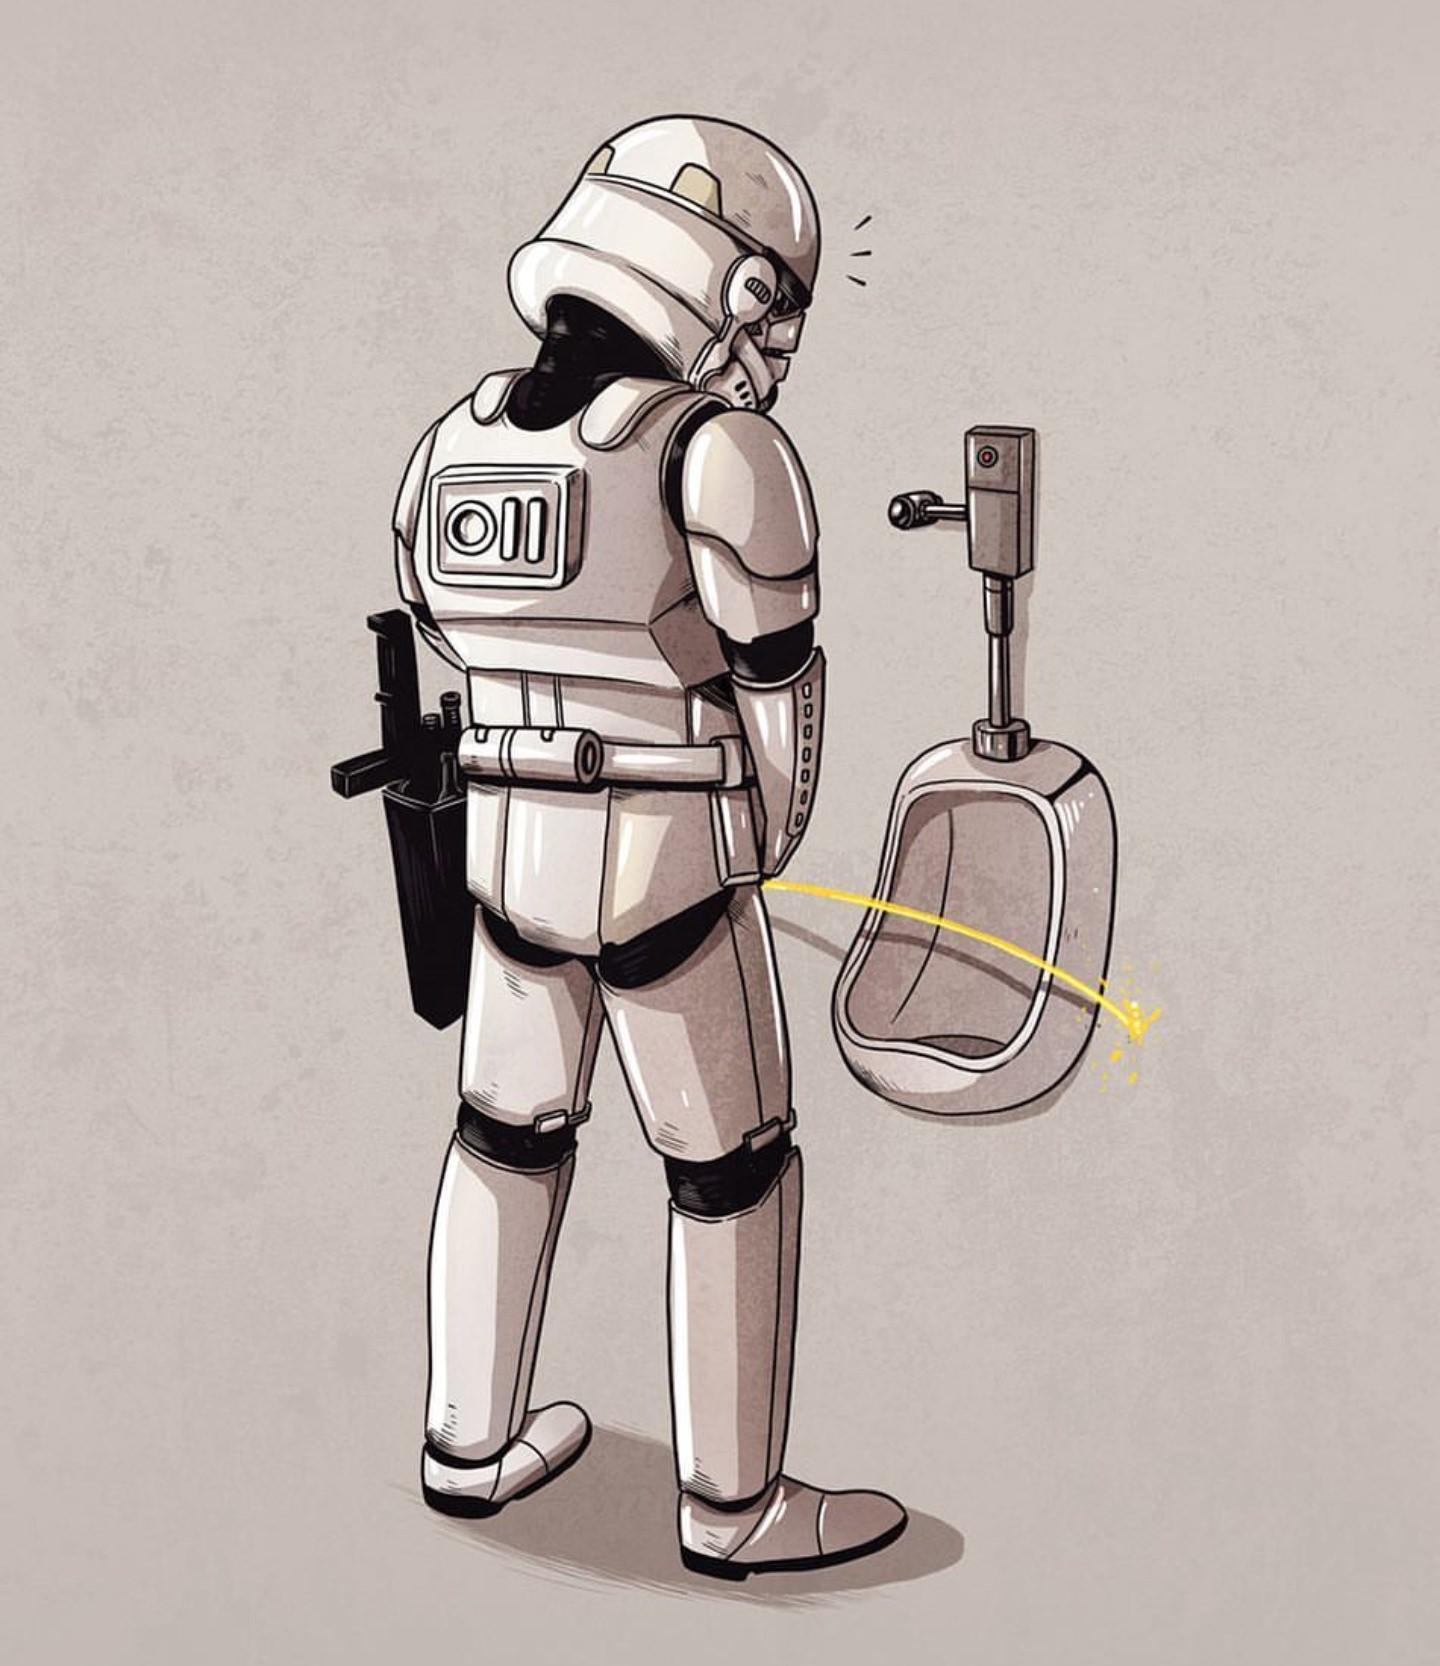 Storm trooper by Alex Solis